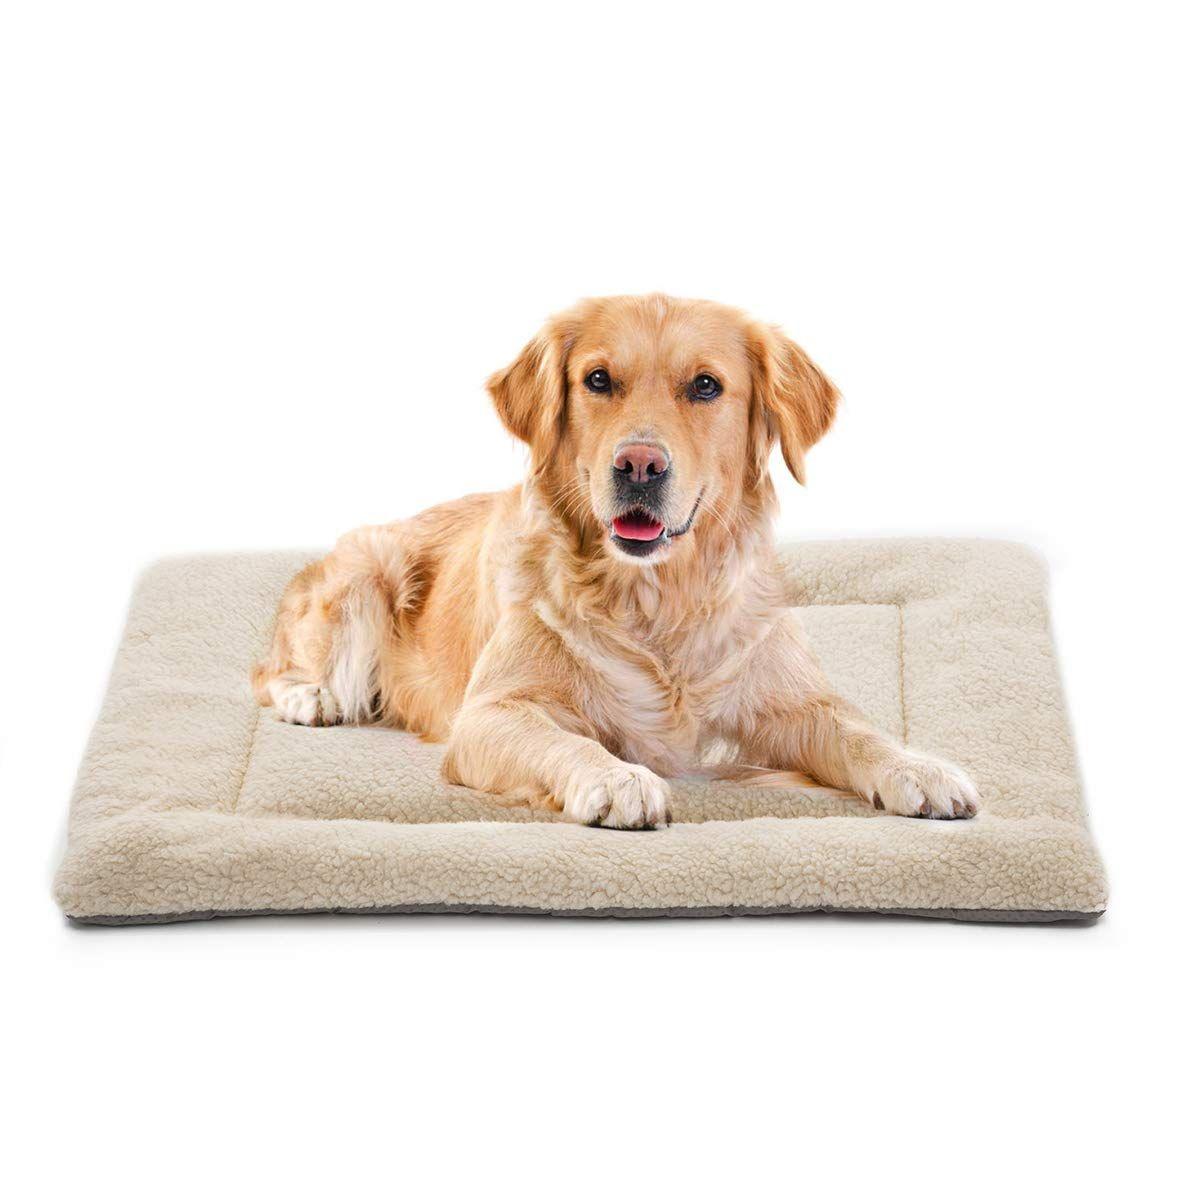 Invenho Dog Bed Mat Comfortable Soft Crate Pad Anti Slip Machine Washable Pad Dog Crate Pad Pet Bed Dog Bed Mat Dog Pet Beds Dog Crate Pads